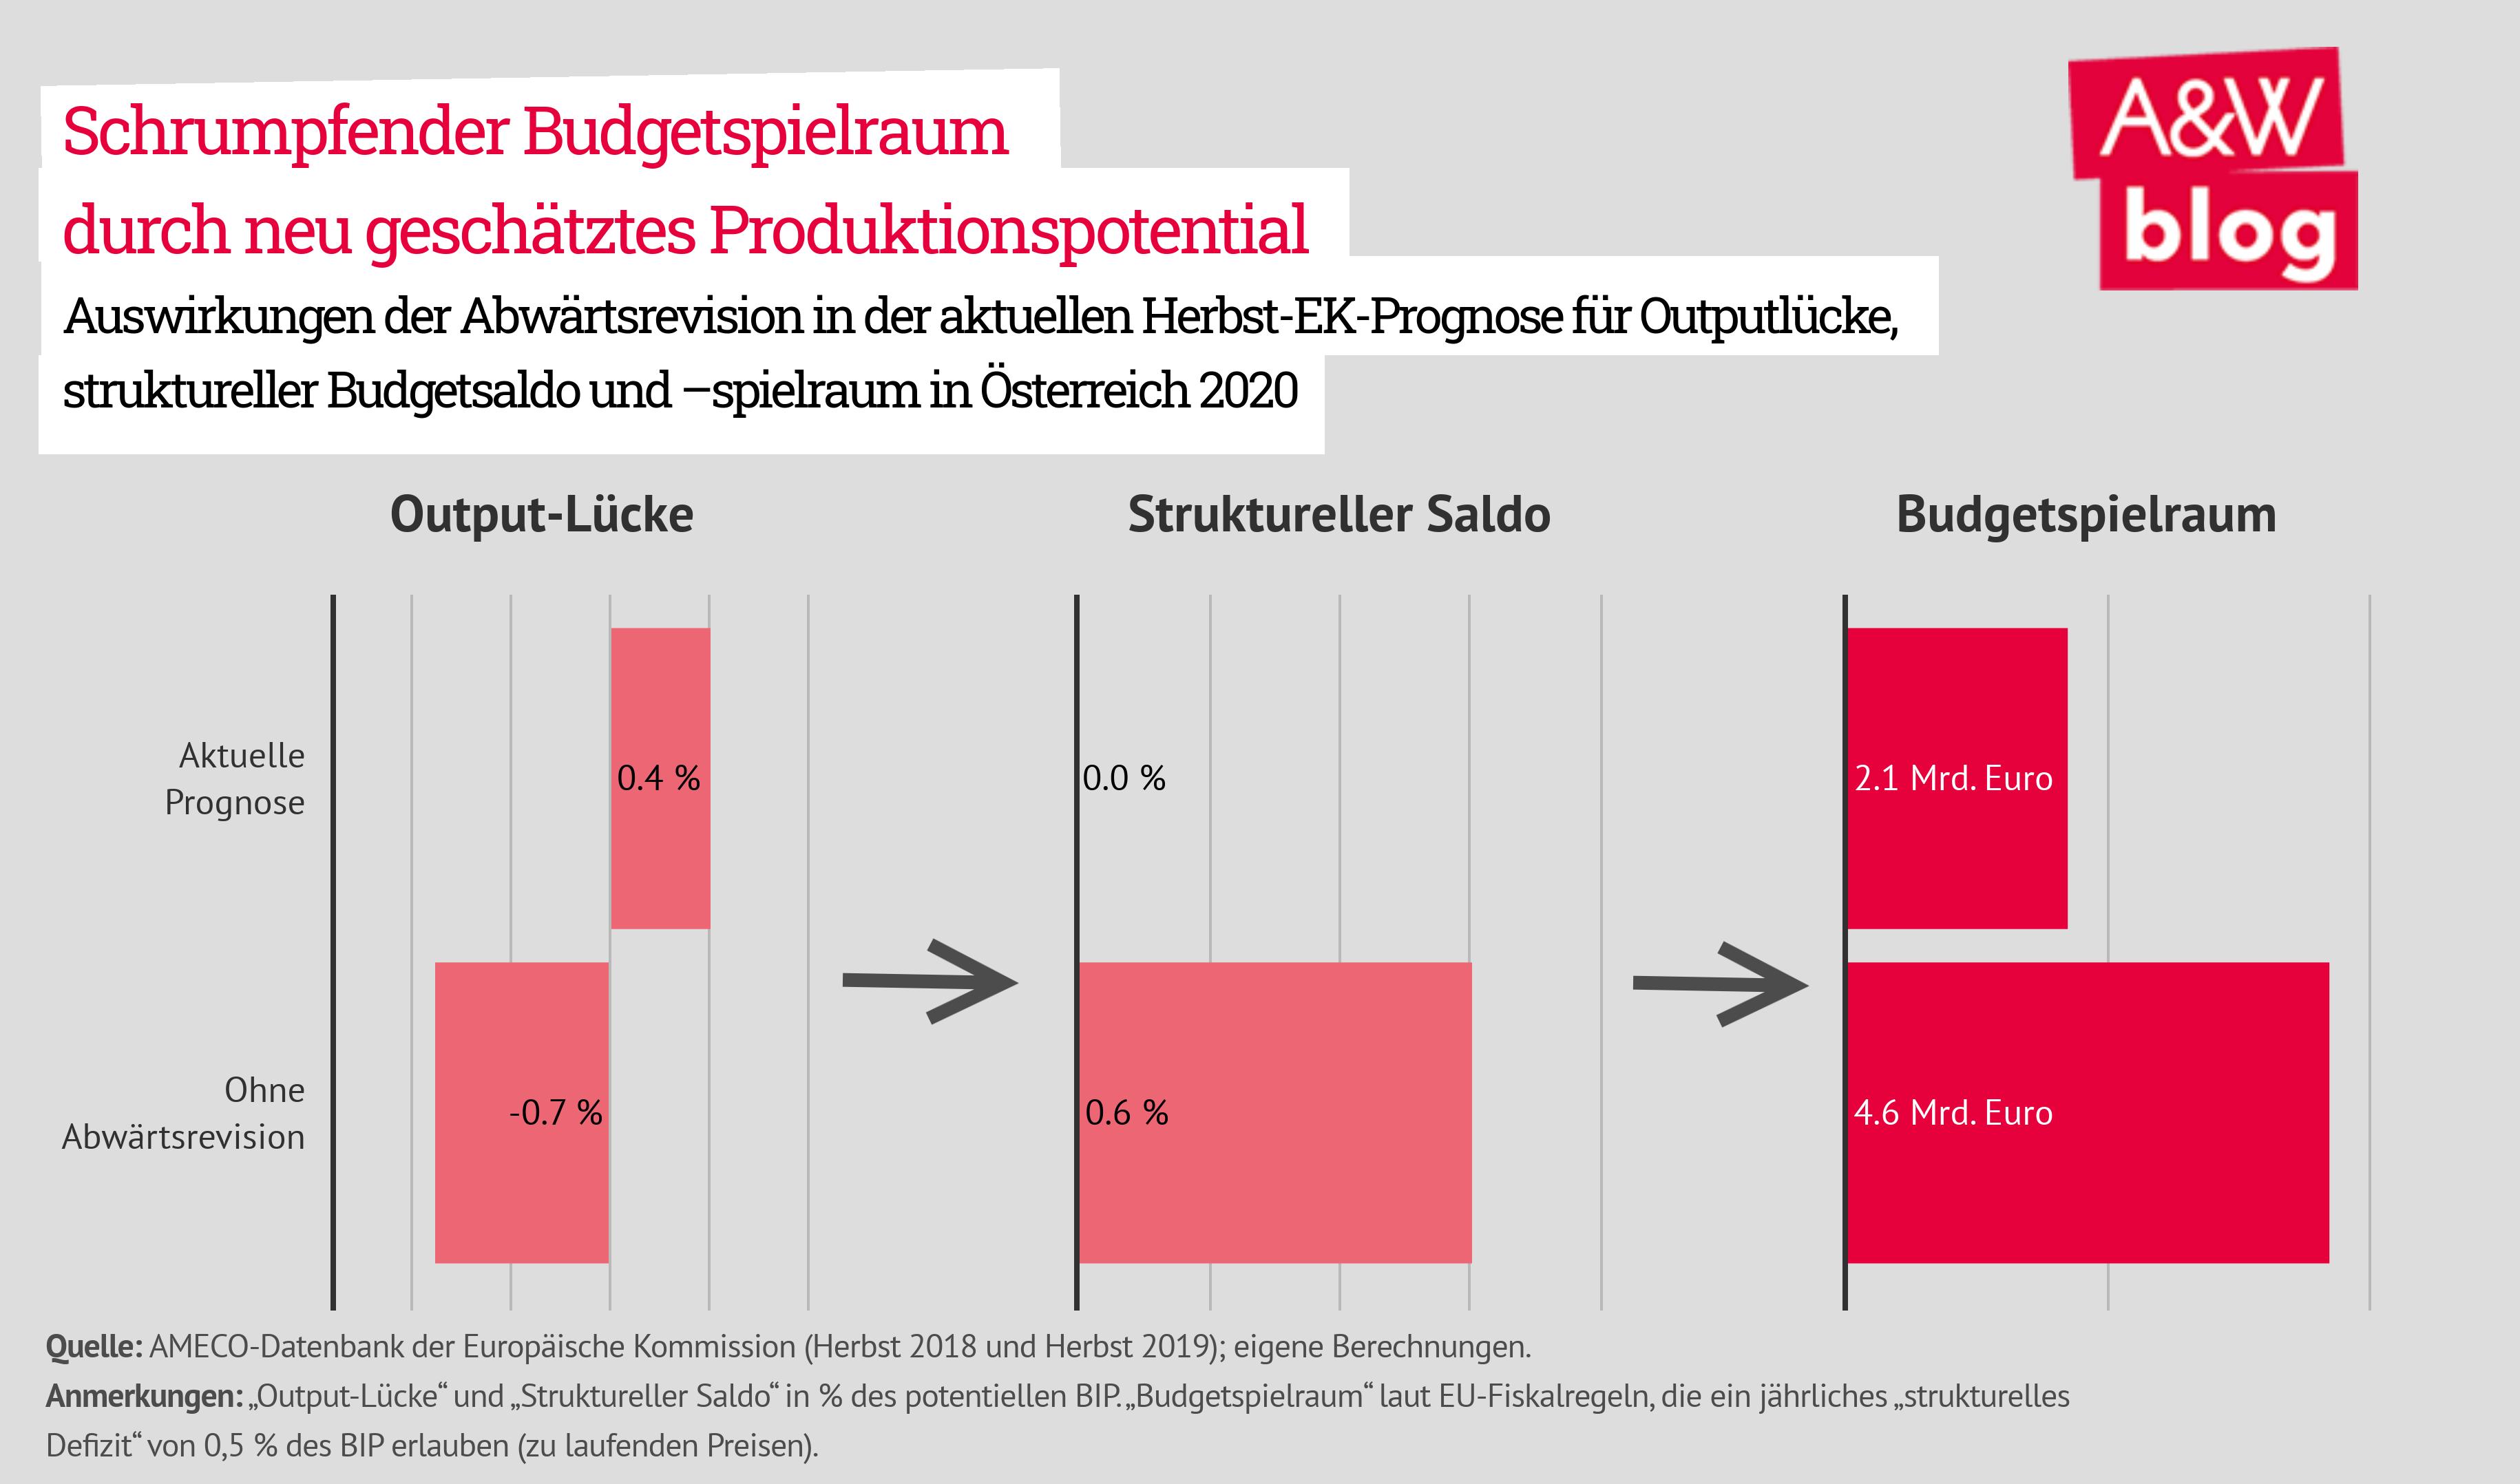 Schrumpfender Budgetspielraum durch neu geschätztes Produktionspotential